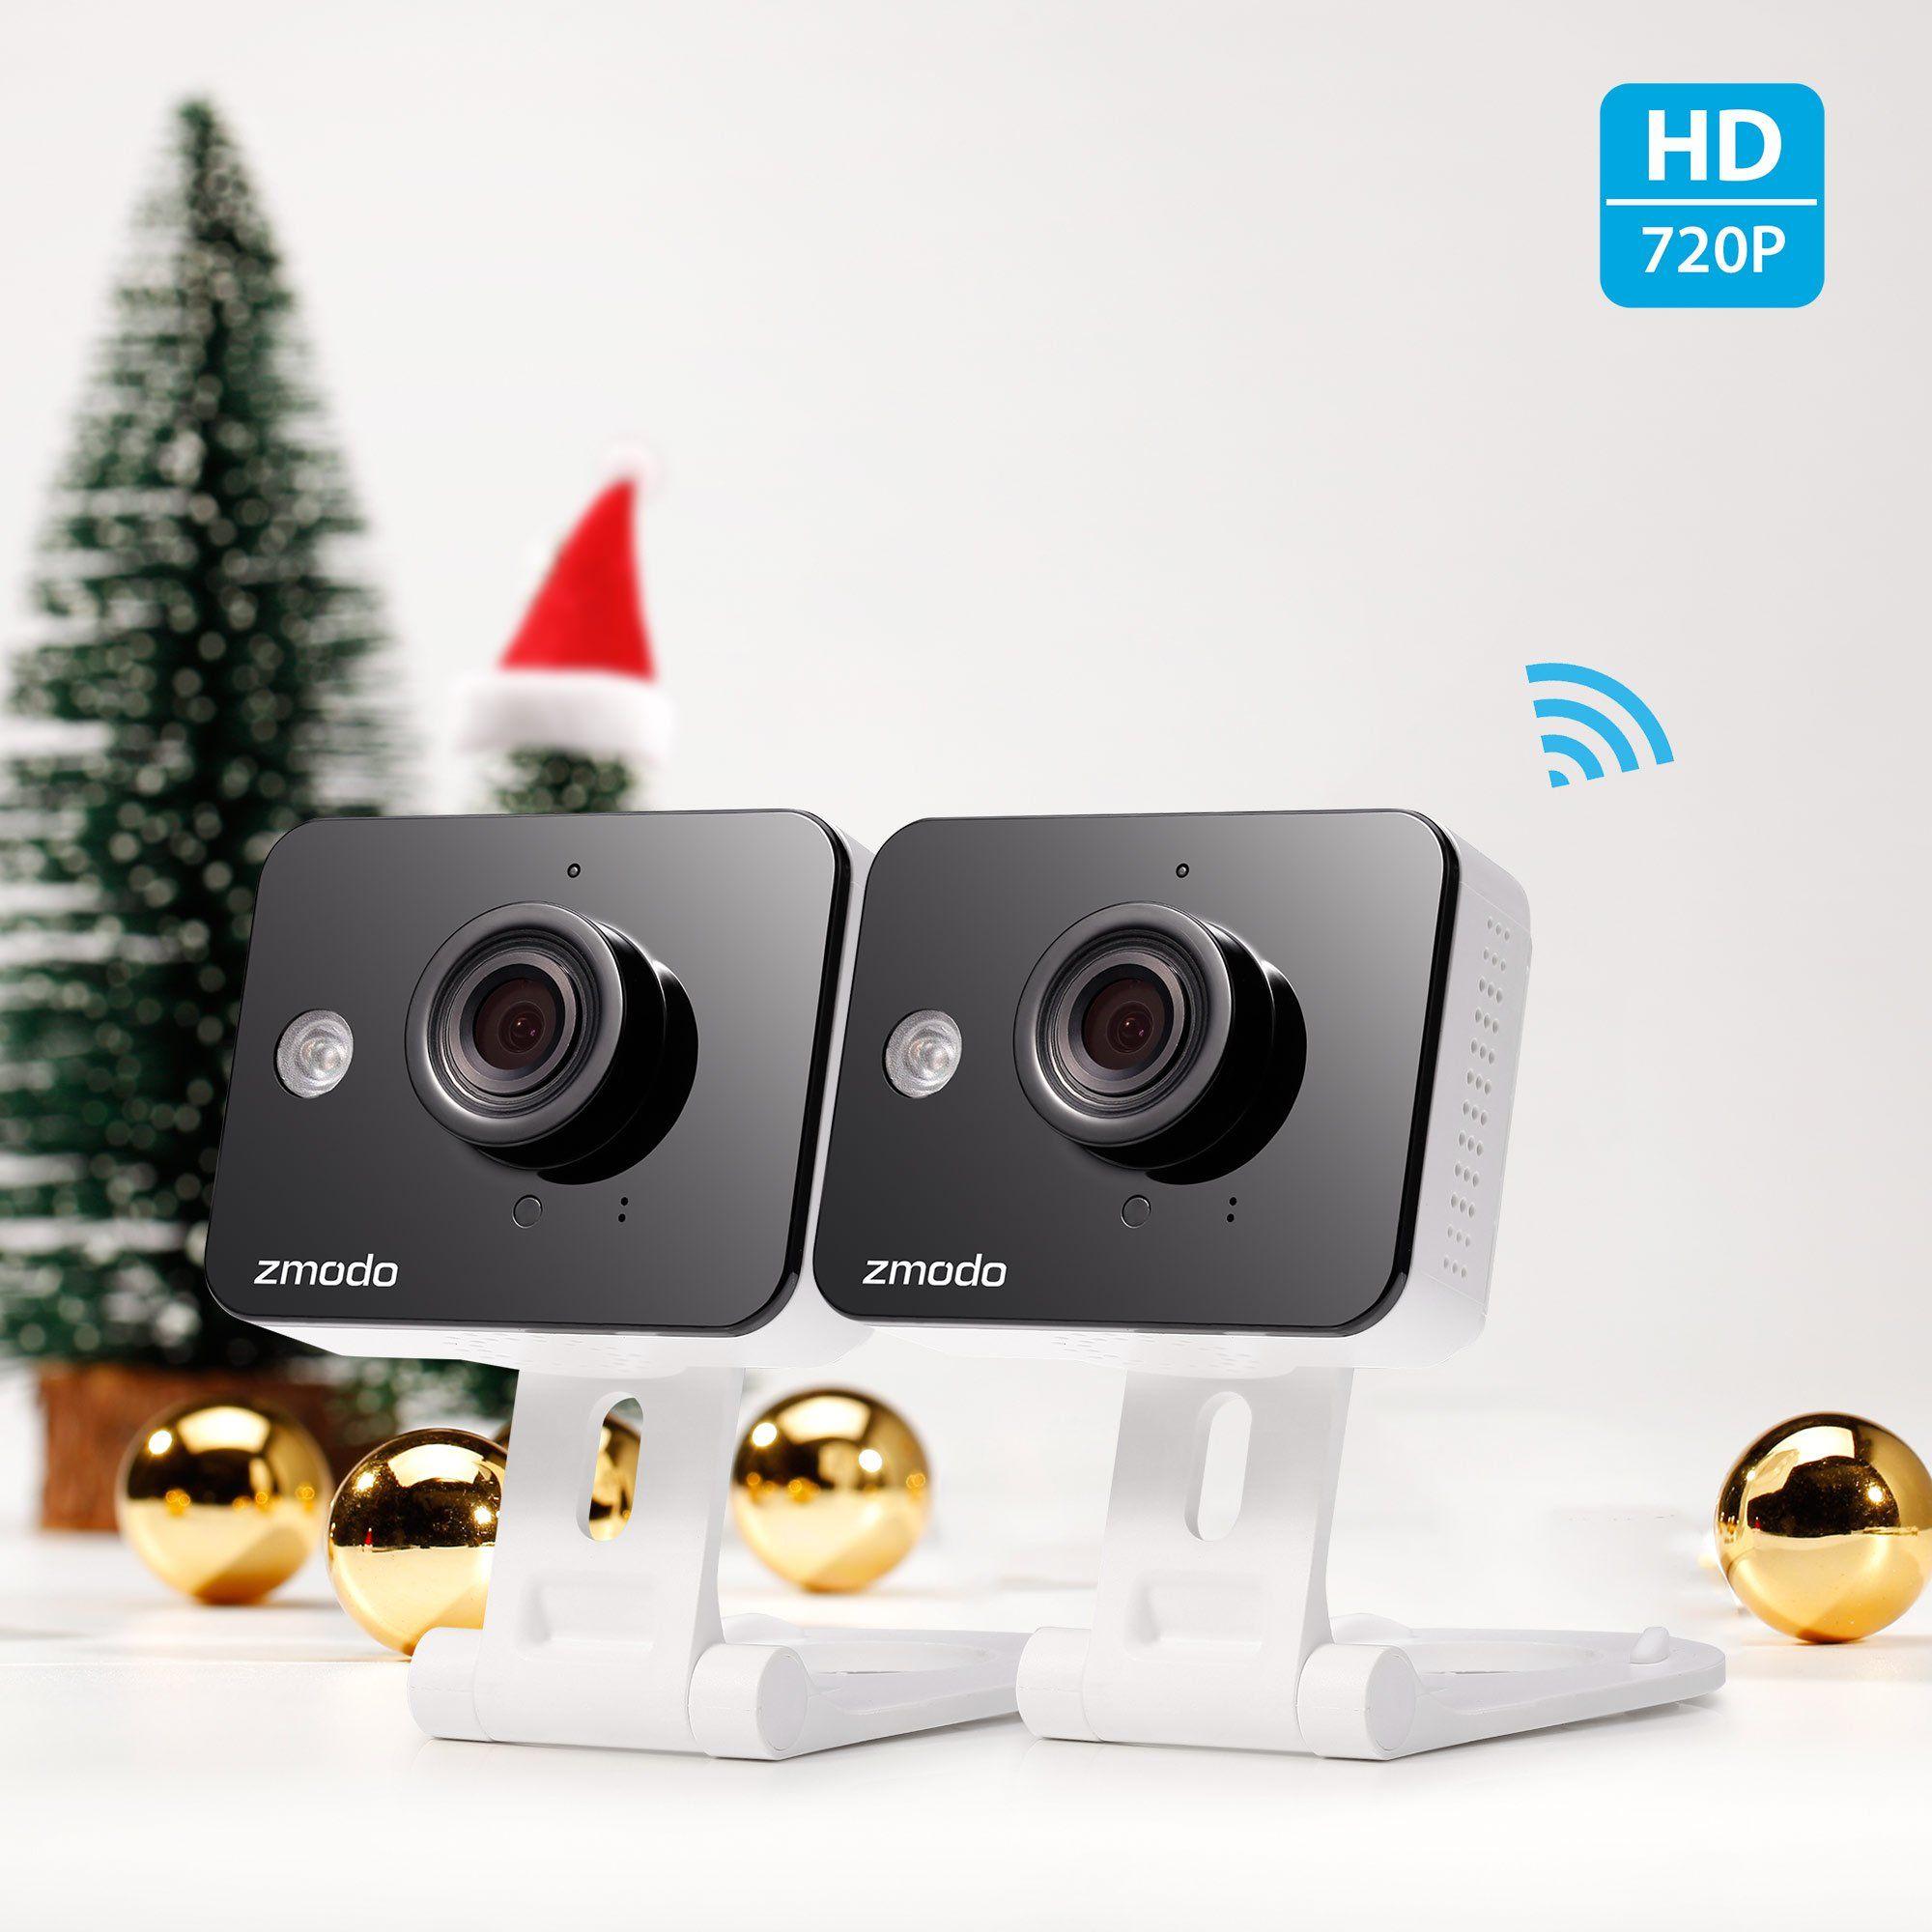 Zmodo 720p HD WiFi Wireless Smart Security Camera TwoWay